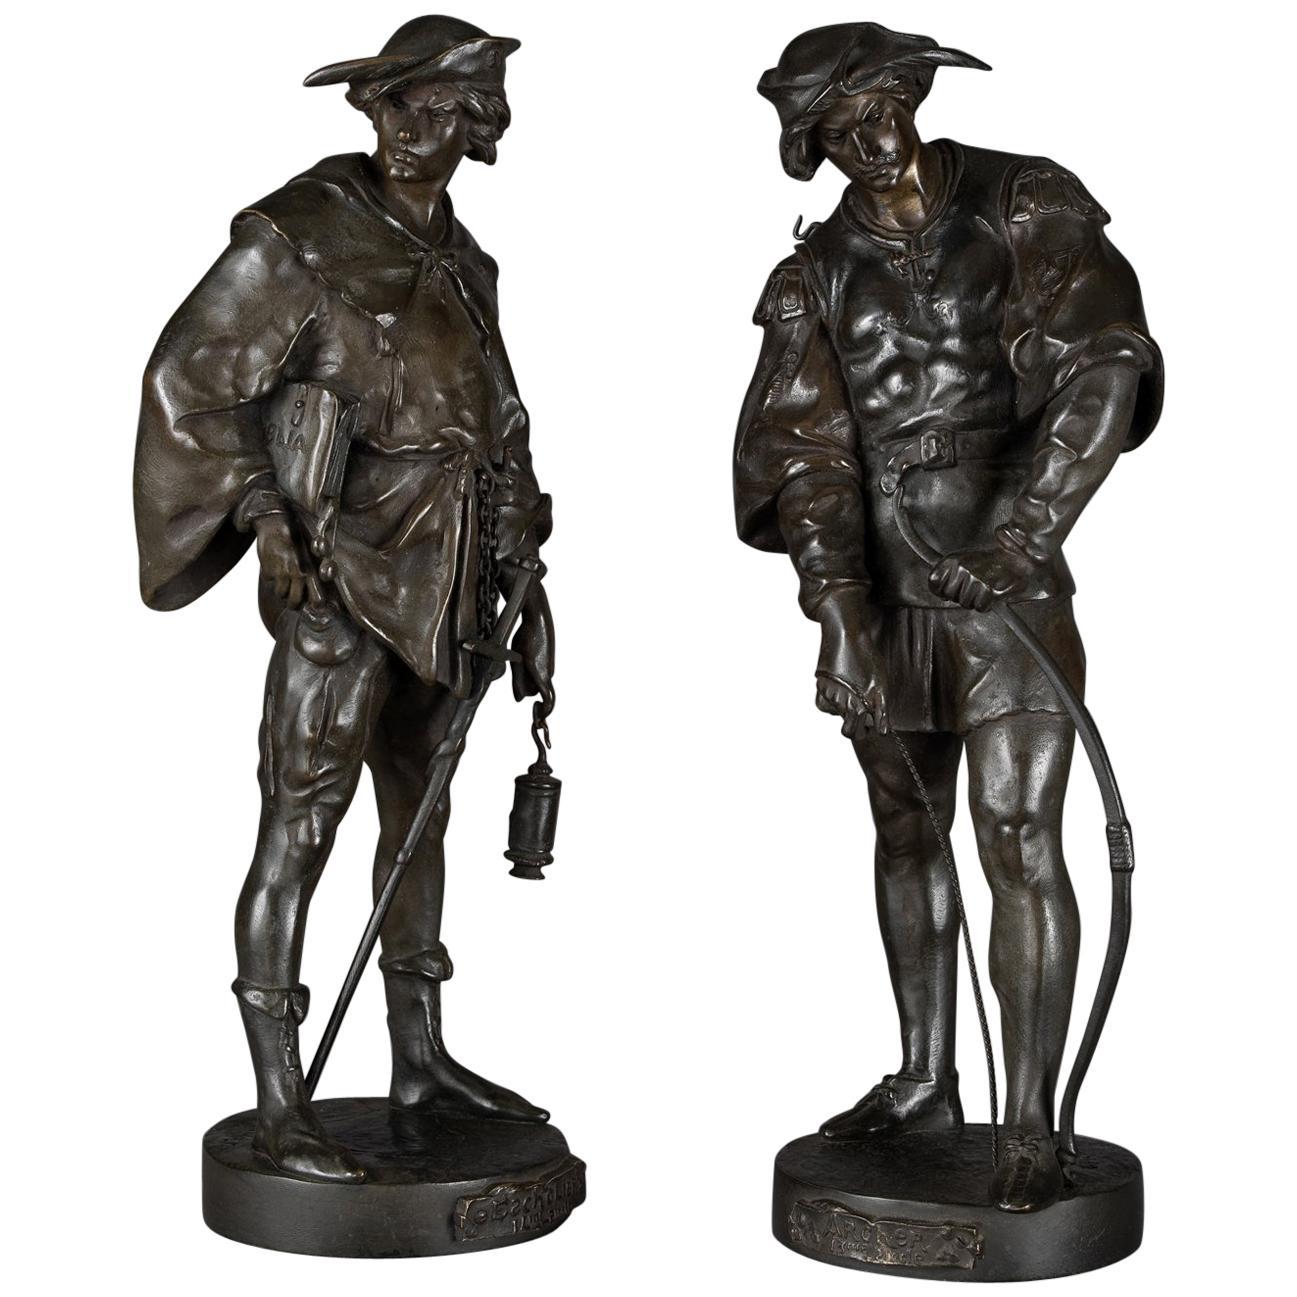 Pair of Patinated Bronze Figures by Émile Louis Picault, circa 1890